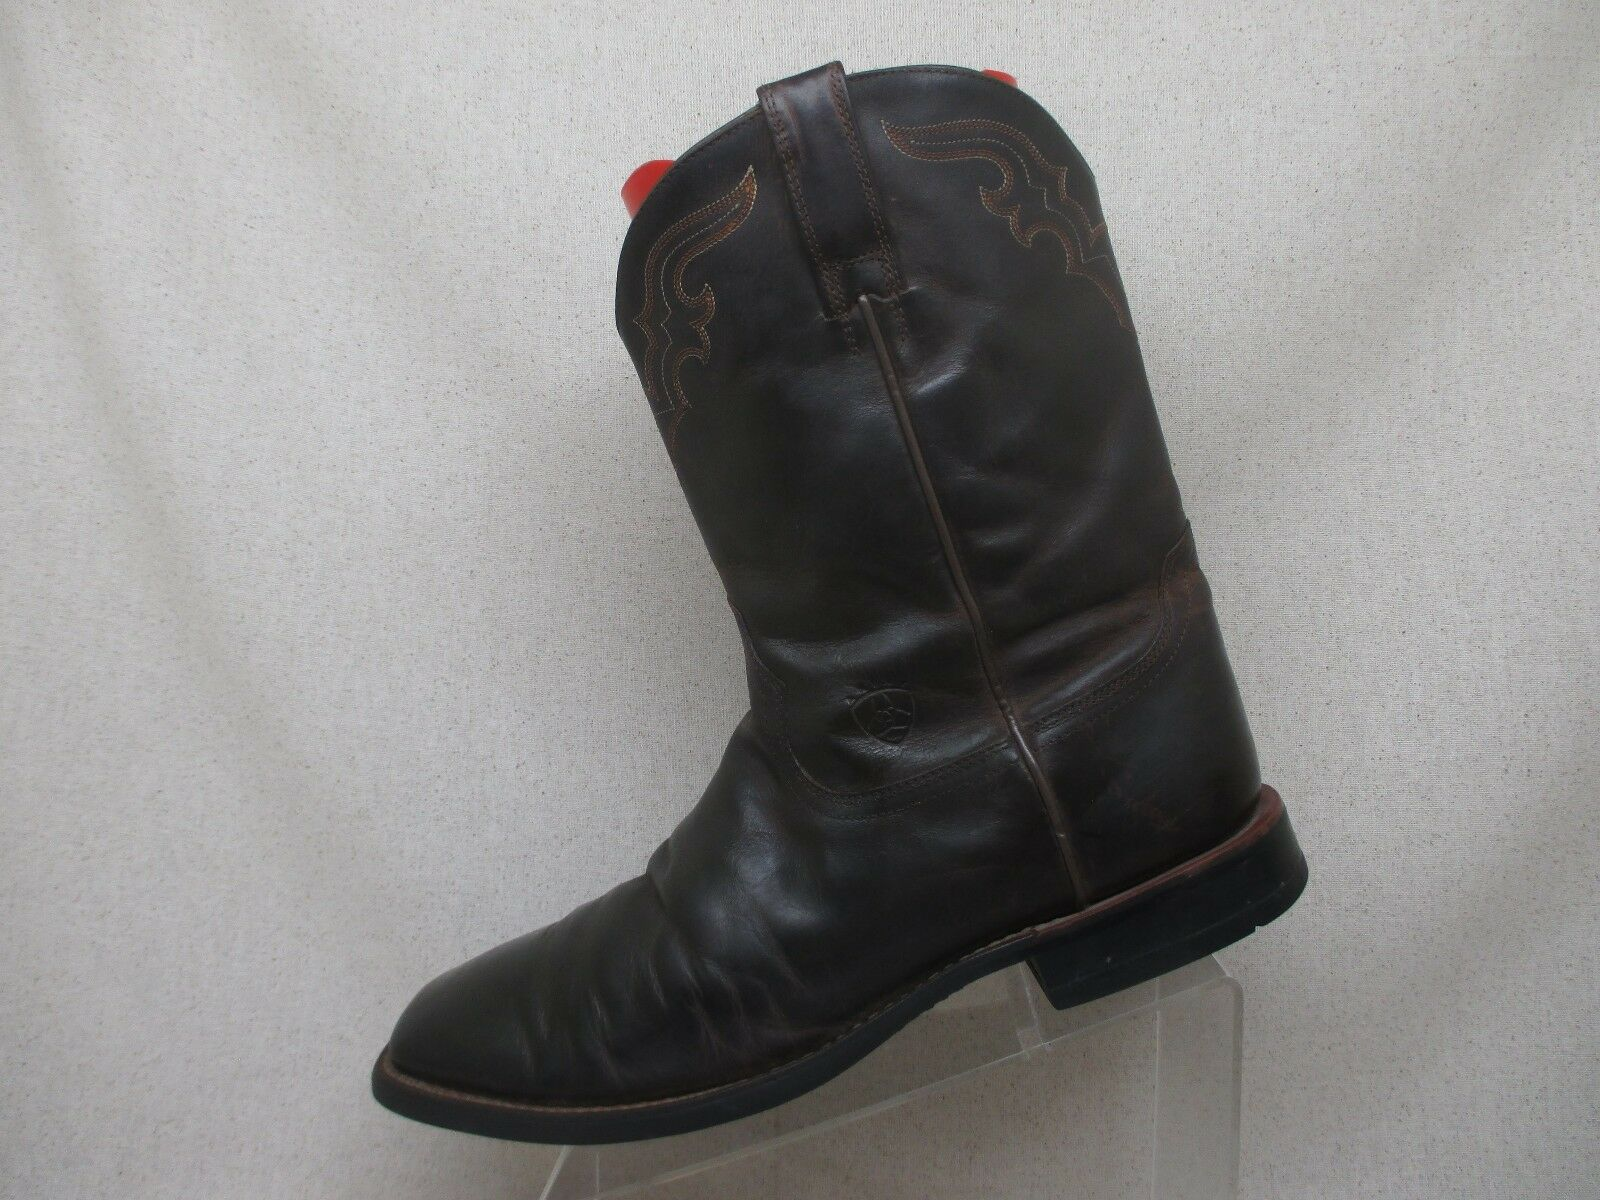 Ariat Braun Leder Stiefel Square Toe Cowboy Western Stiefel Leder Men Größe 12 D Style 38594 bc9d7d